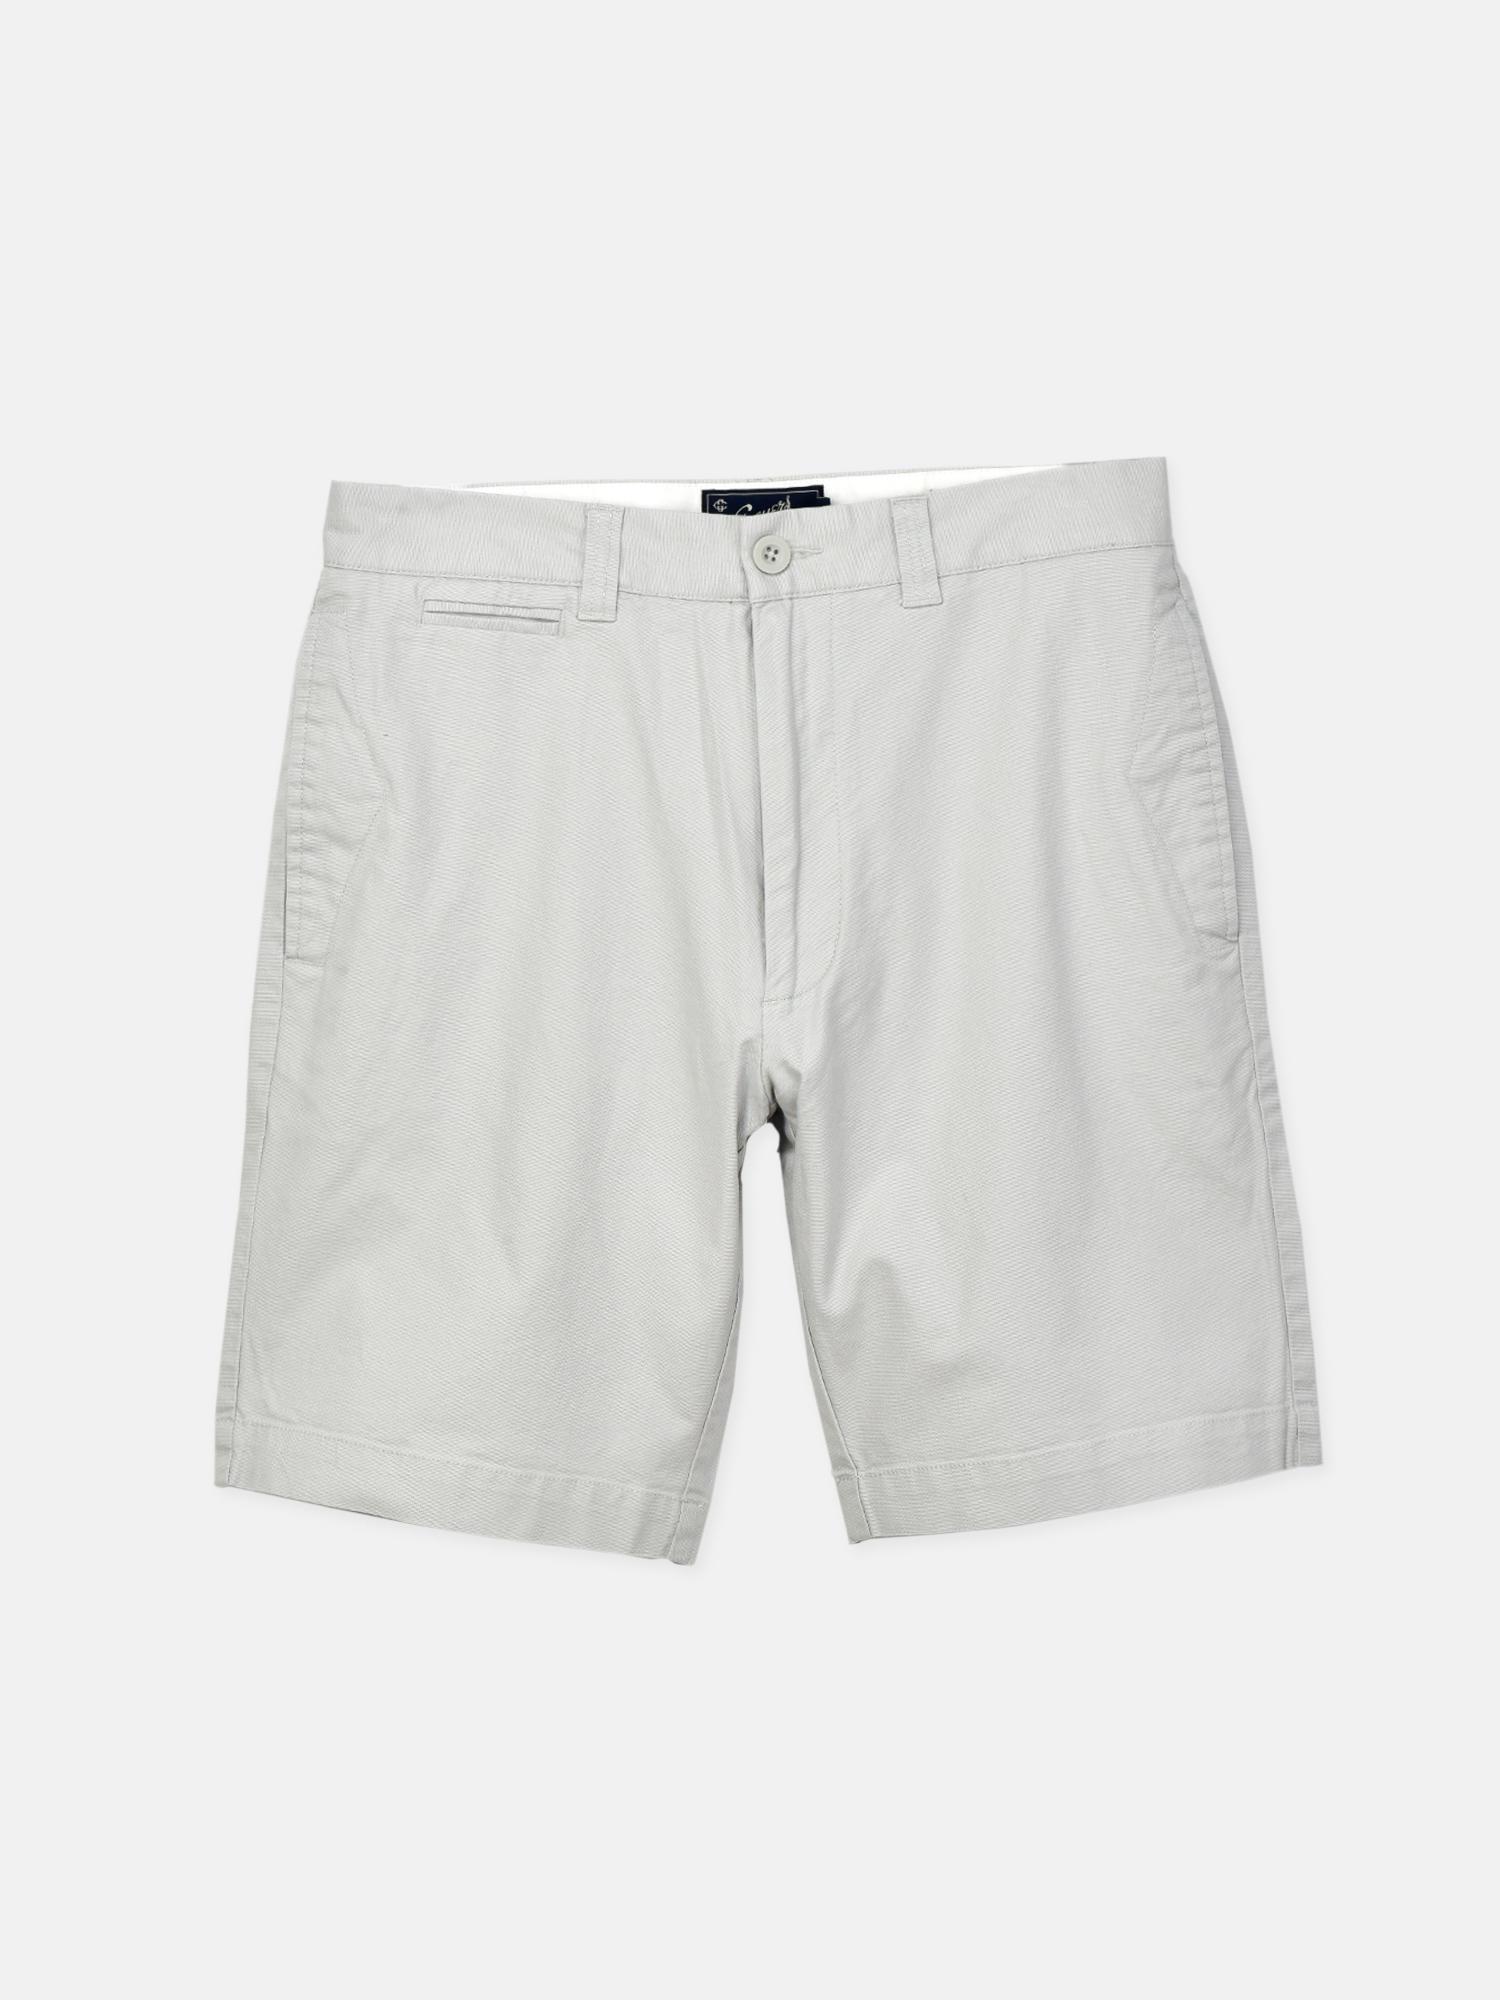 Newport Garment Dyed Canvas Shorts-0001